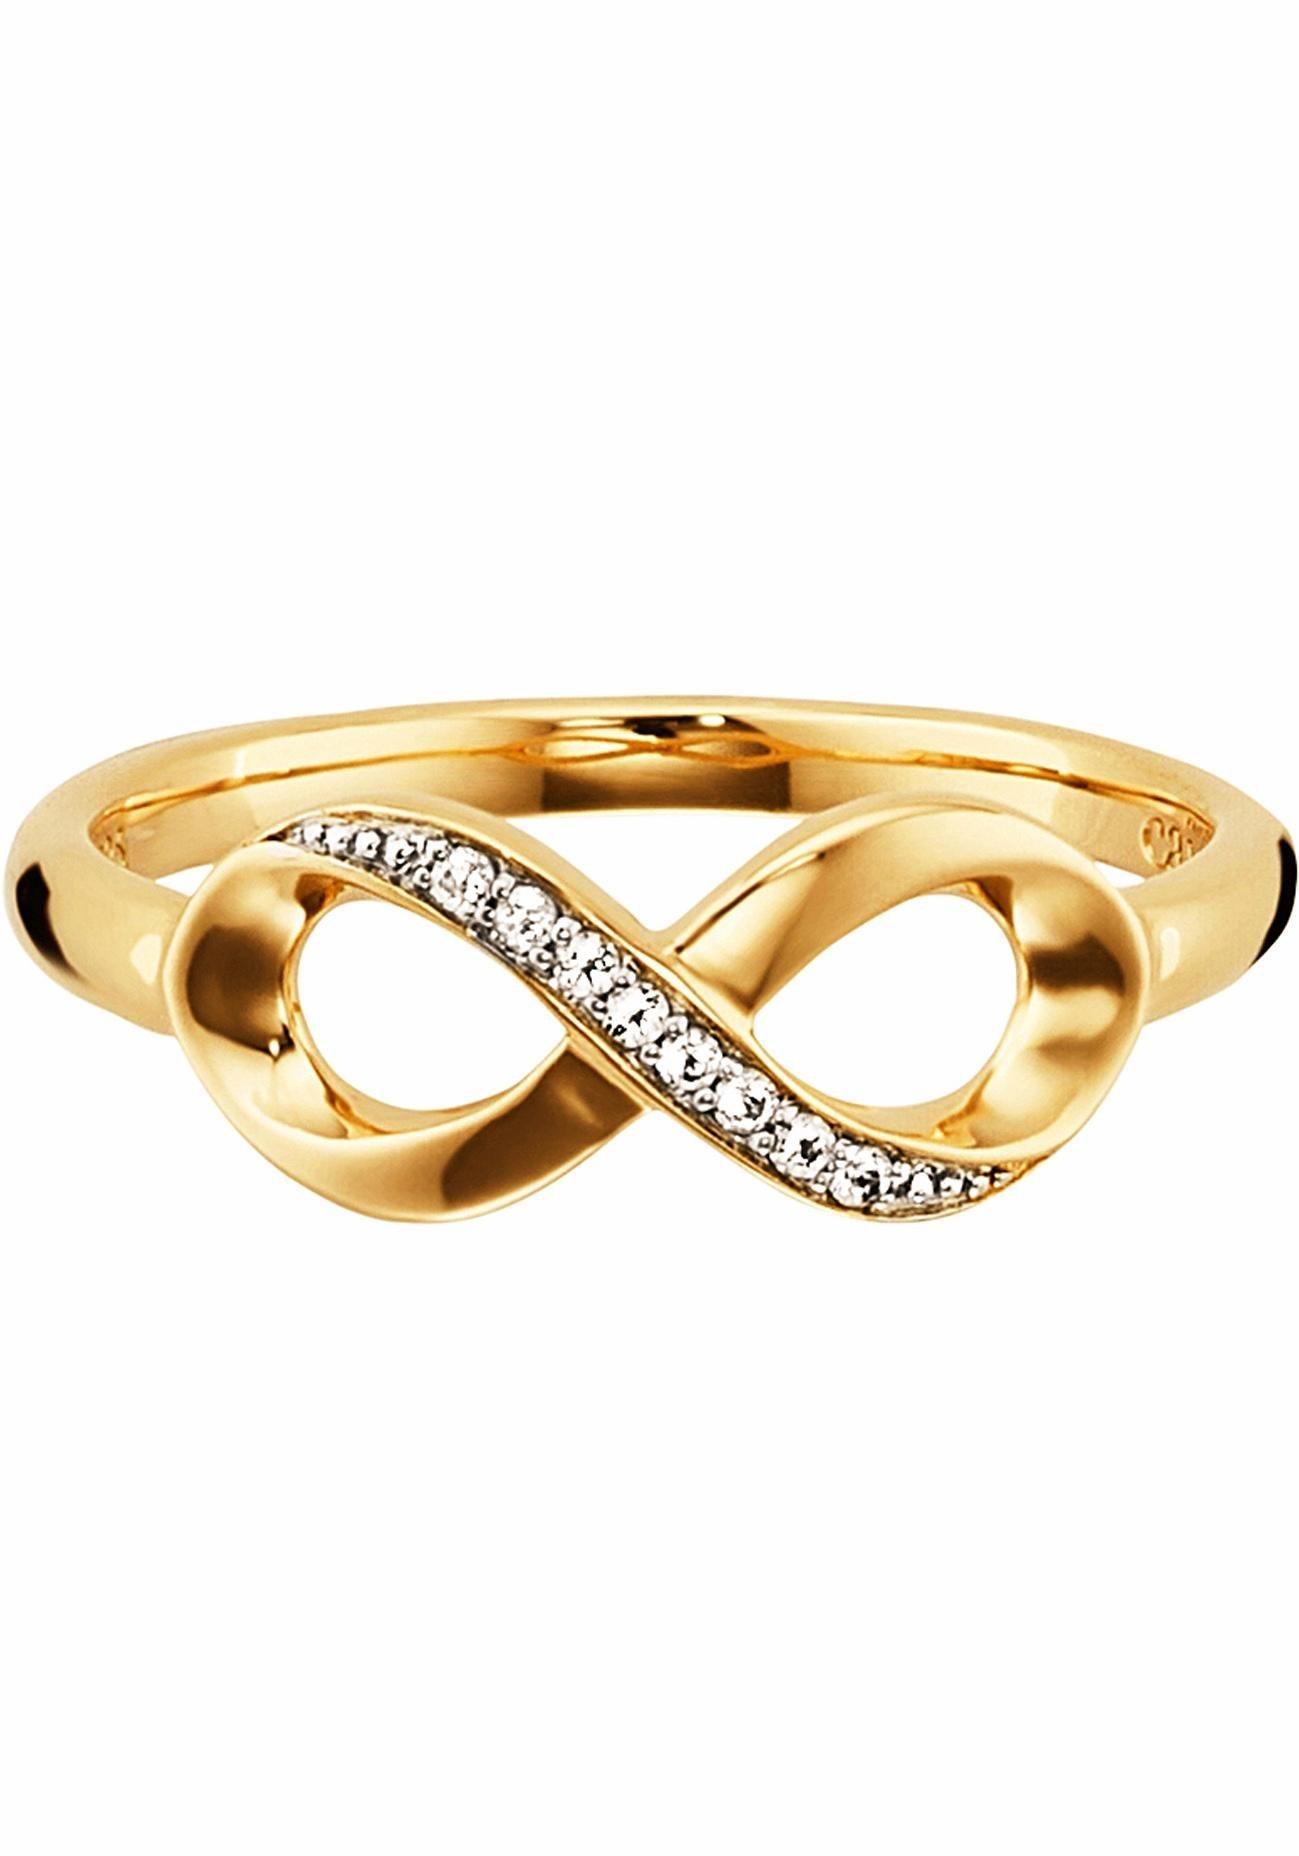 CAÏ Fingerring »Infinity, Unendlichkeitsschleife, sensitive dancer, C1814R/90/93/«, mit Topas | Schmuck > Ringe > Fingerringe | Silber | CAÏ